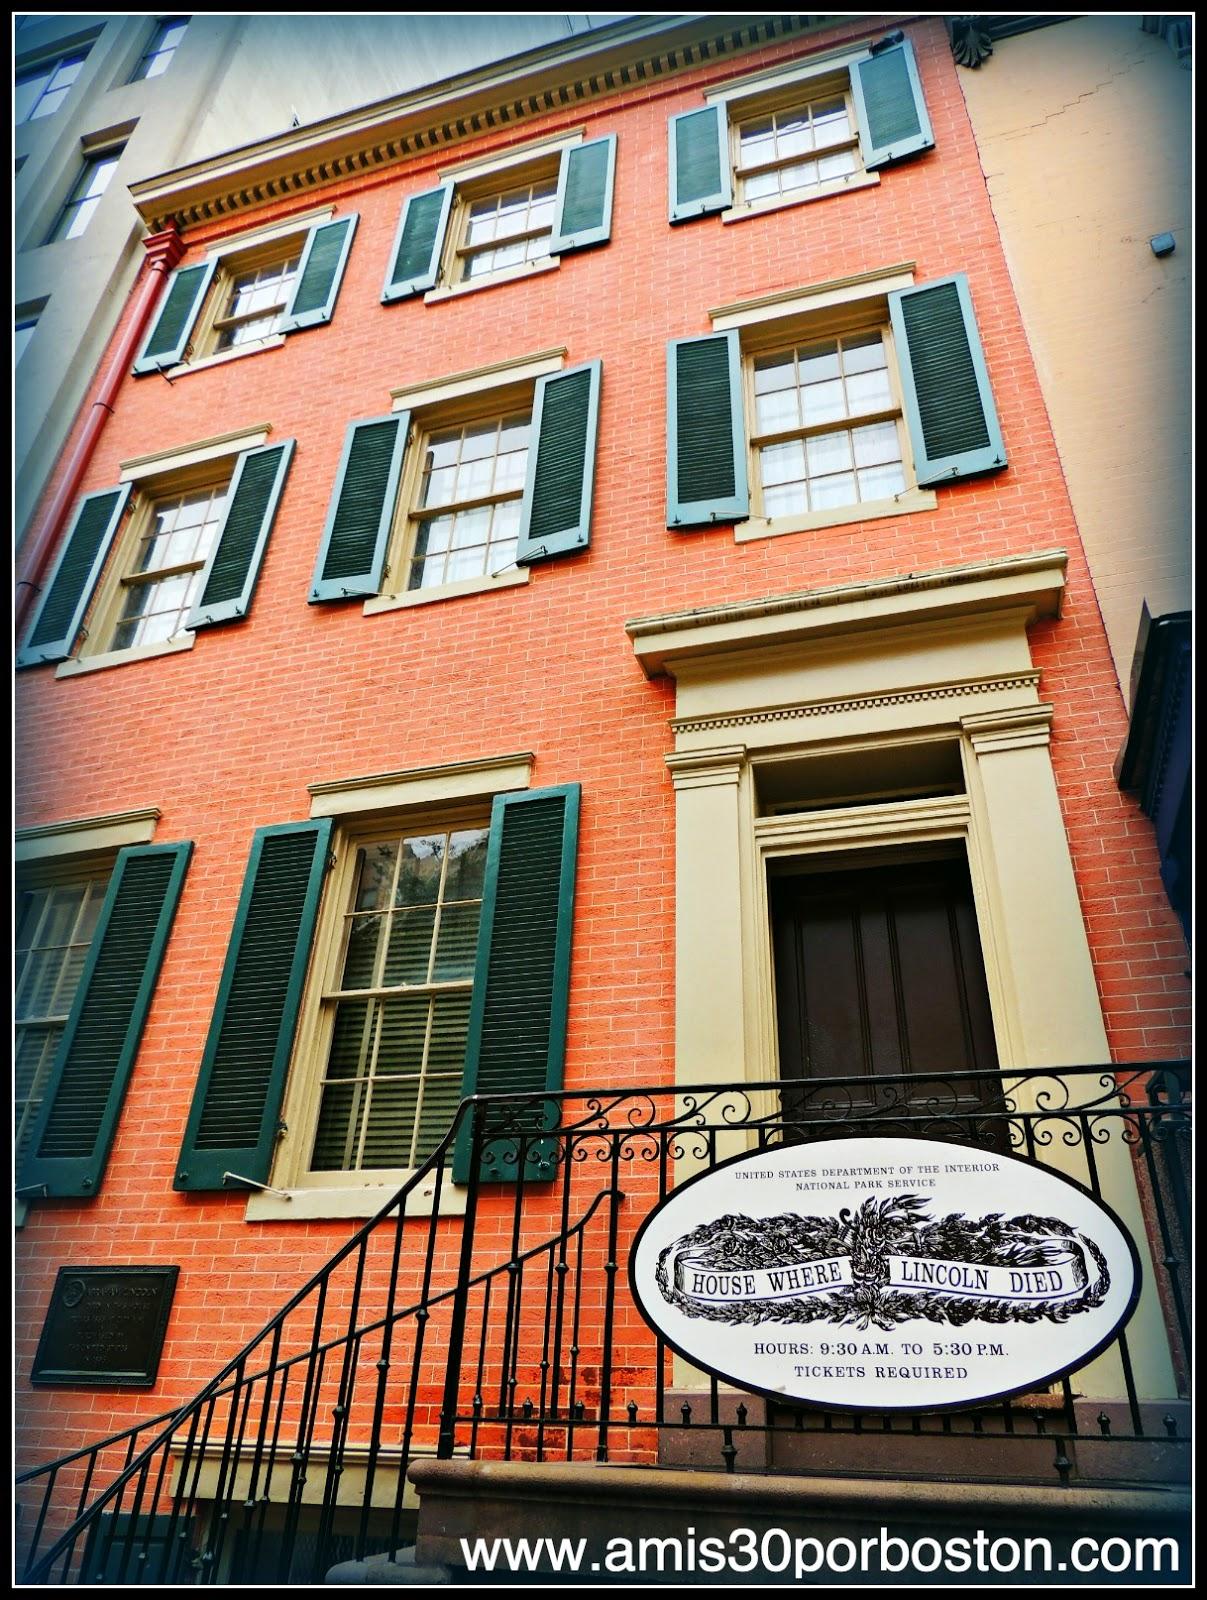 Peterson House: Lugar de la Muerte del Presidente Abraham Lincoln